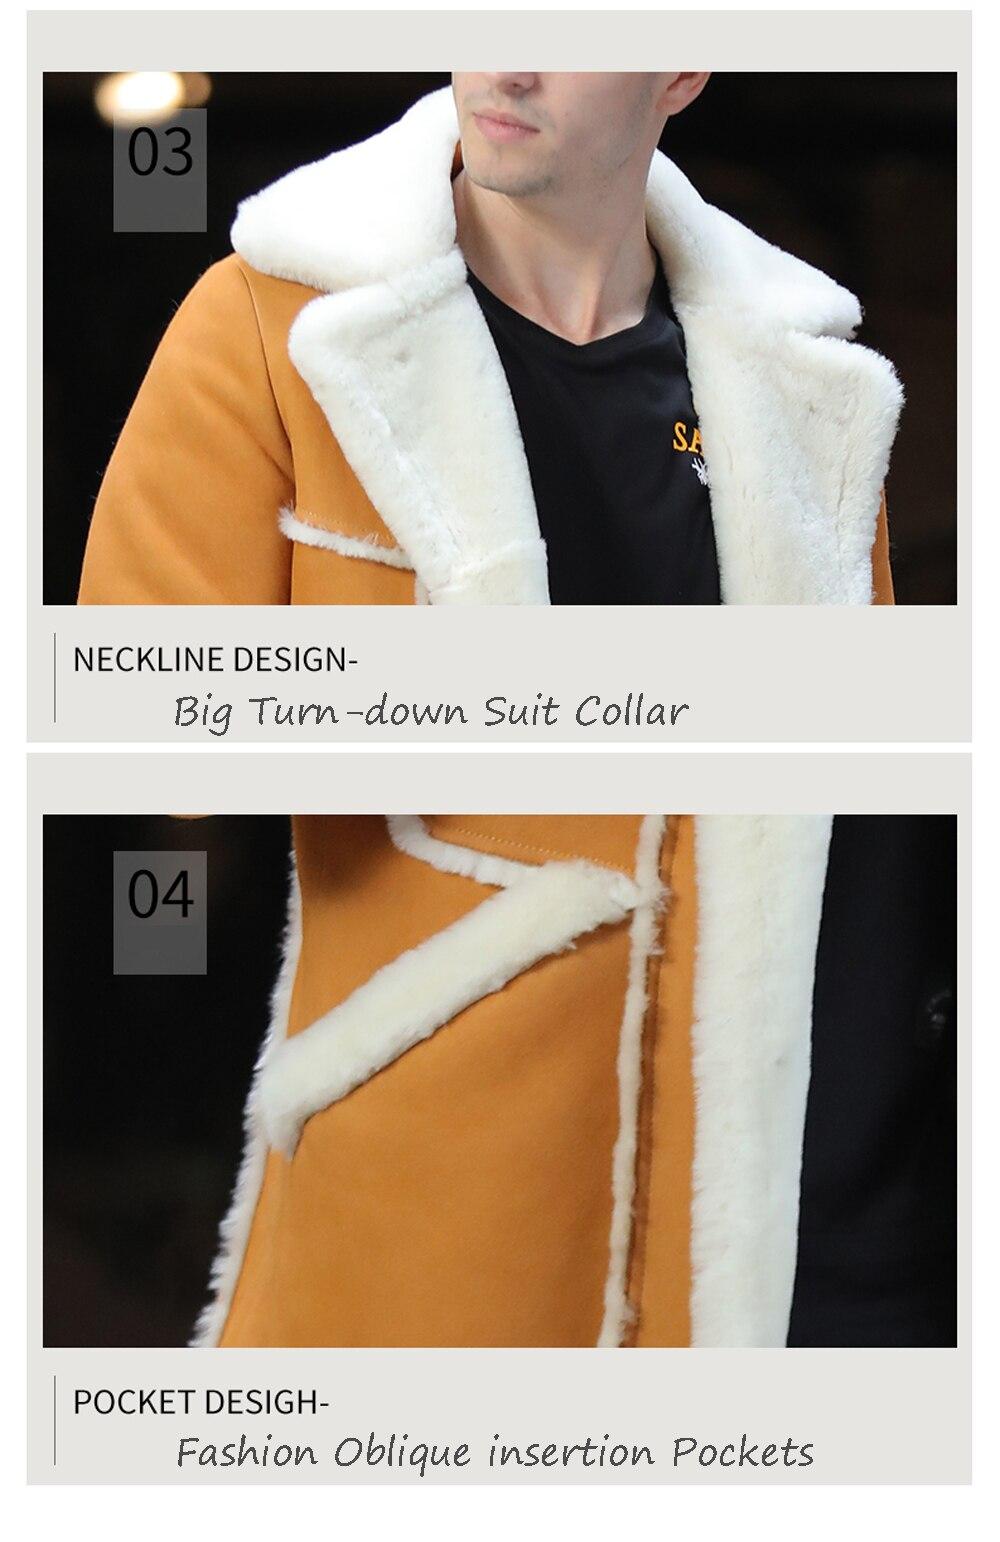 Hd53e4a1655a64429b1c1c56b3ea0ade3s Men Luxury Fur Shearling Coat Yellow Soft Thicken Fur Coat Winter Male Formal Business Fur Sheepskin Jackets